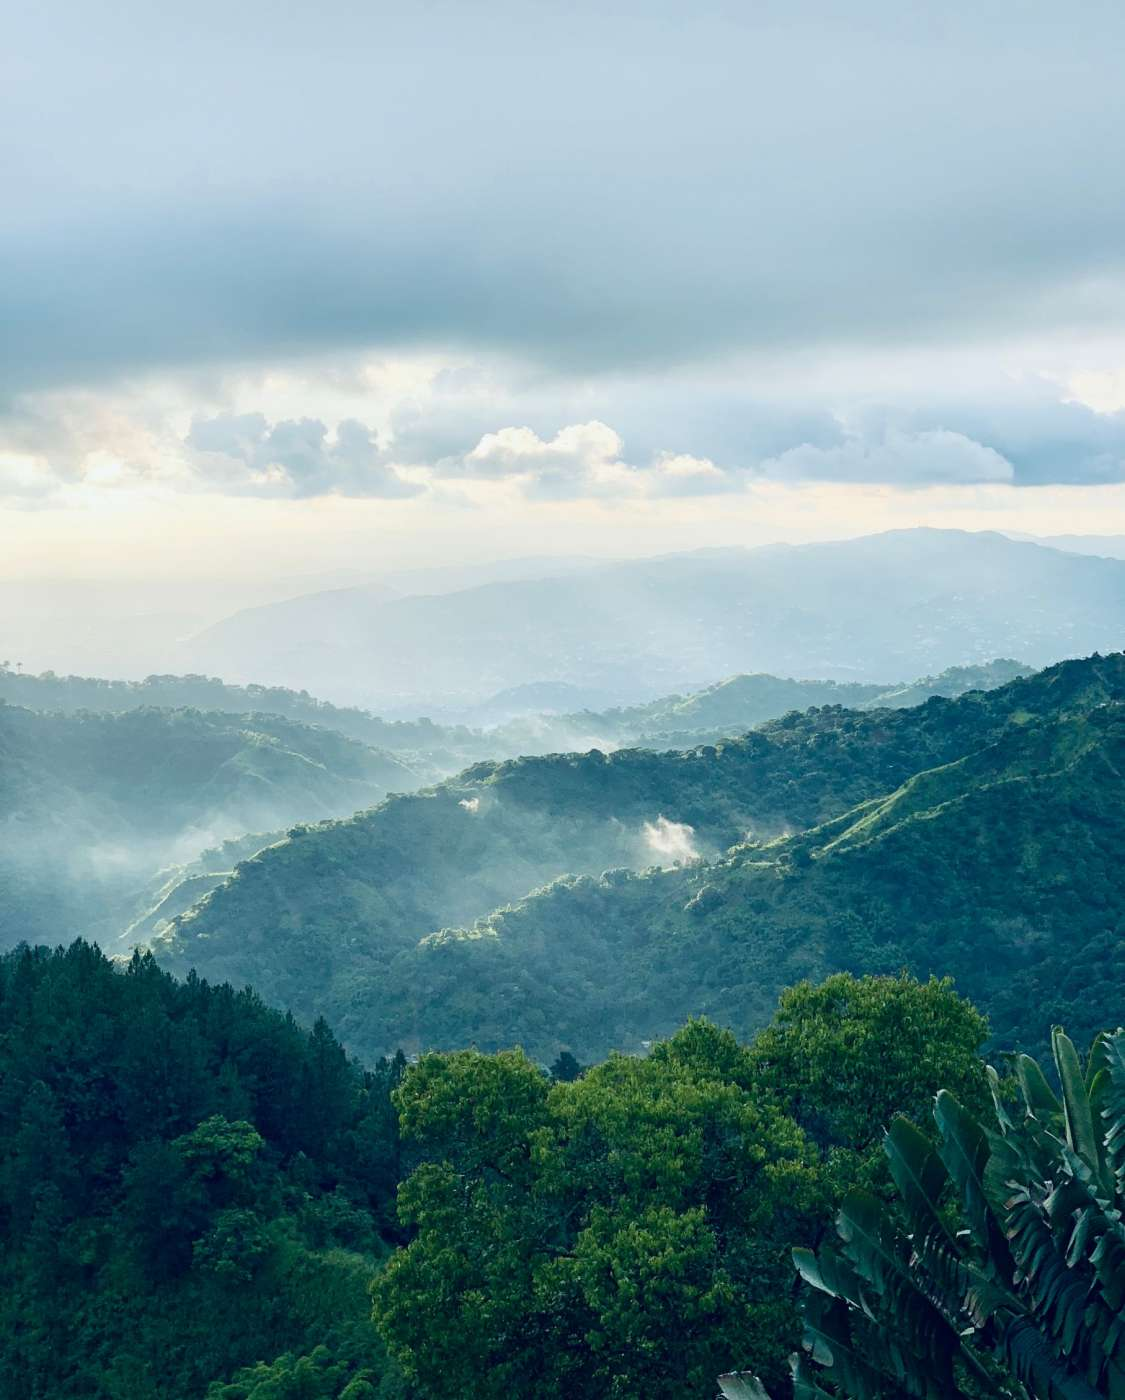 hiking-blue-mountain-peak-jamaica